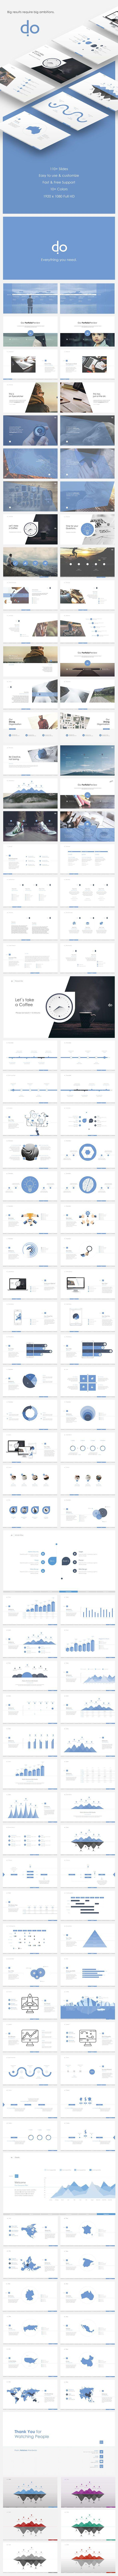 do Powerpoint Presentation Template. Download here: http://graphicriver.net/item/do-powerpoint-presentation/15649071?ref=ksioks